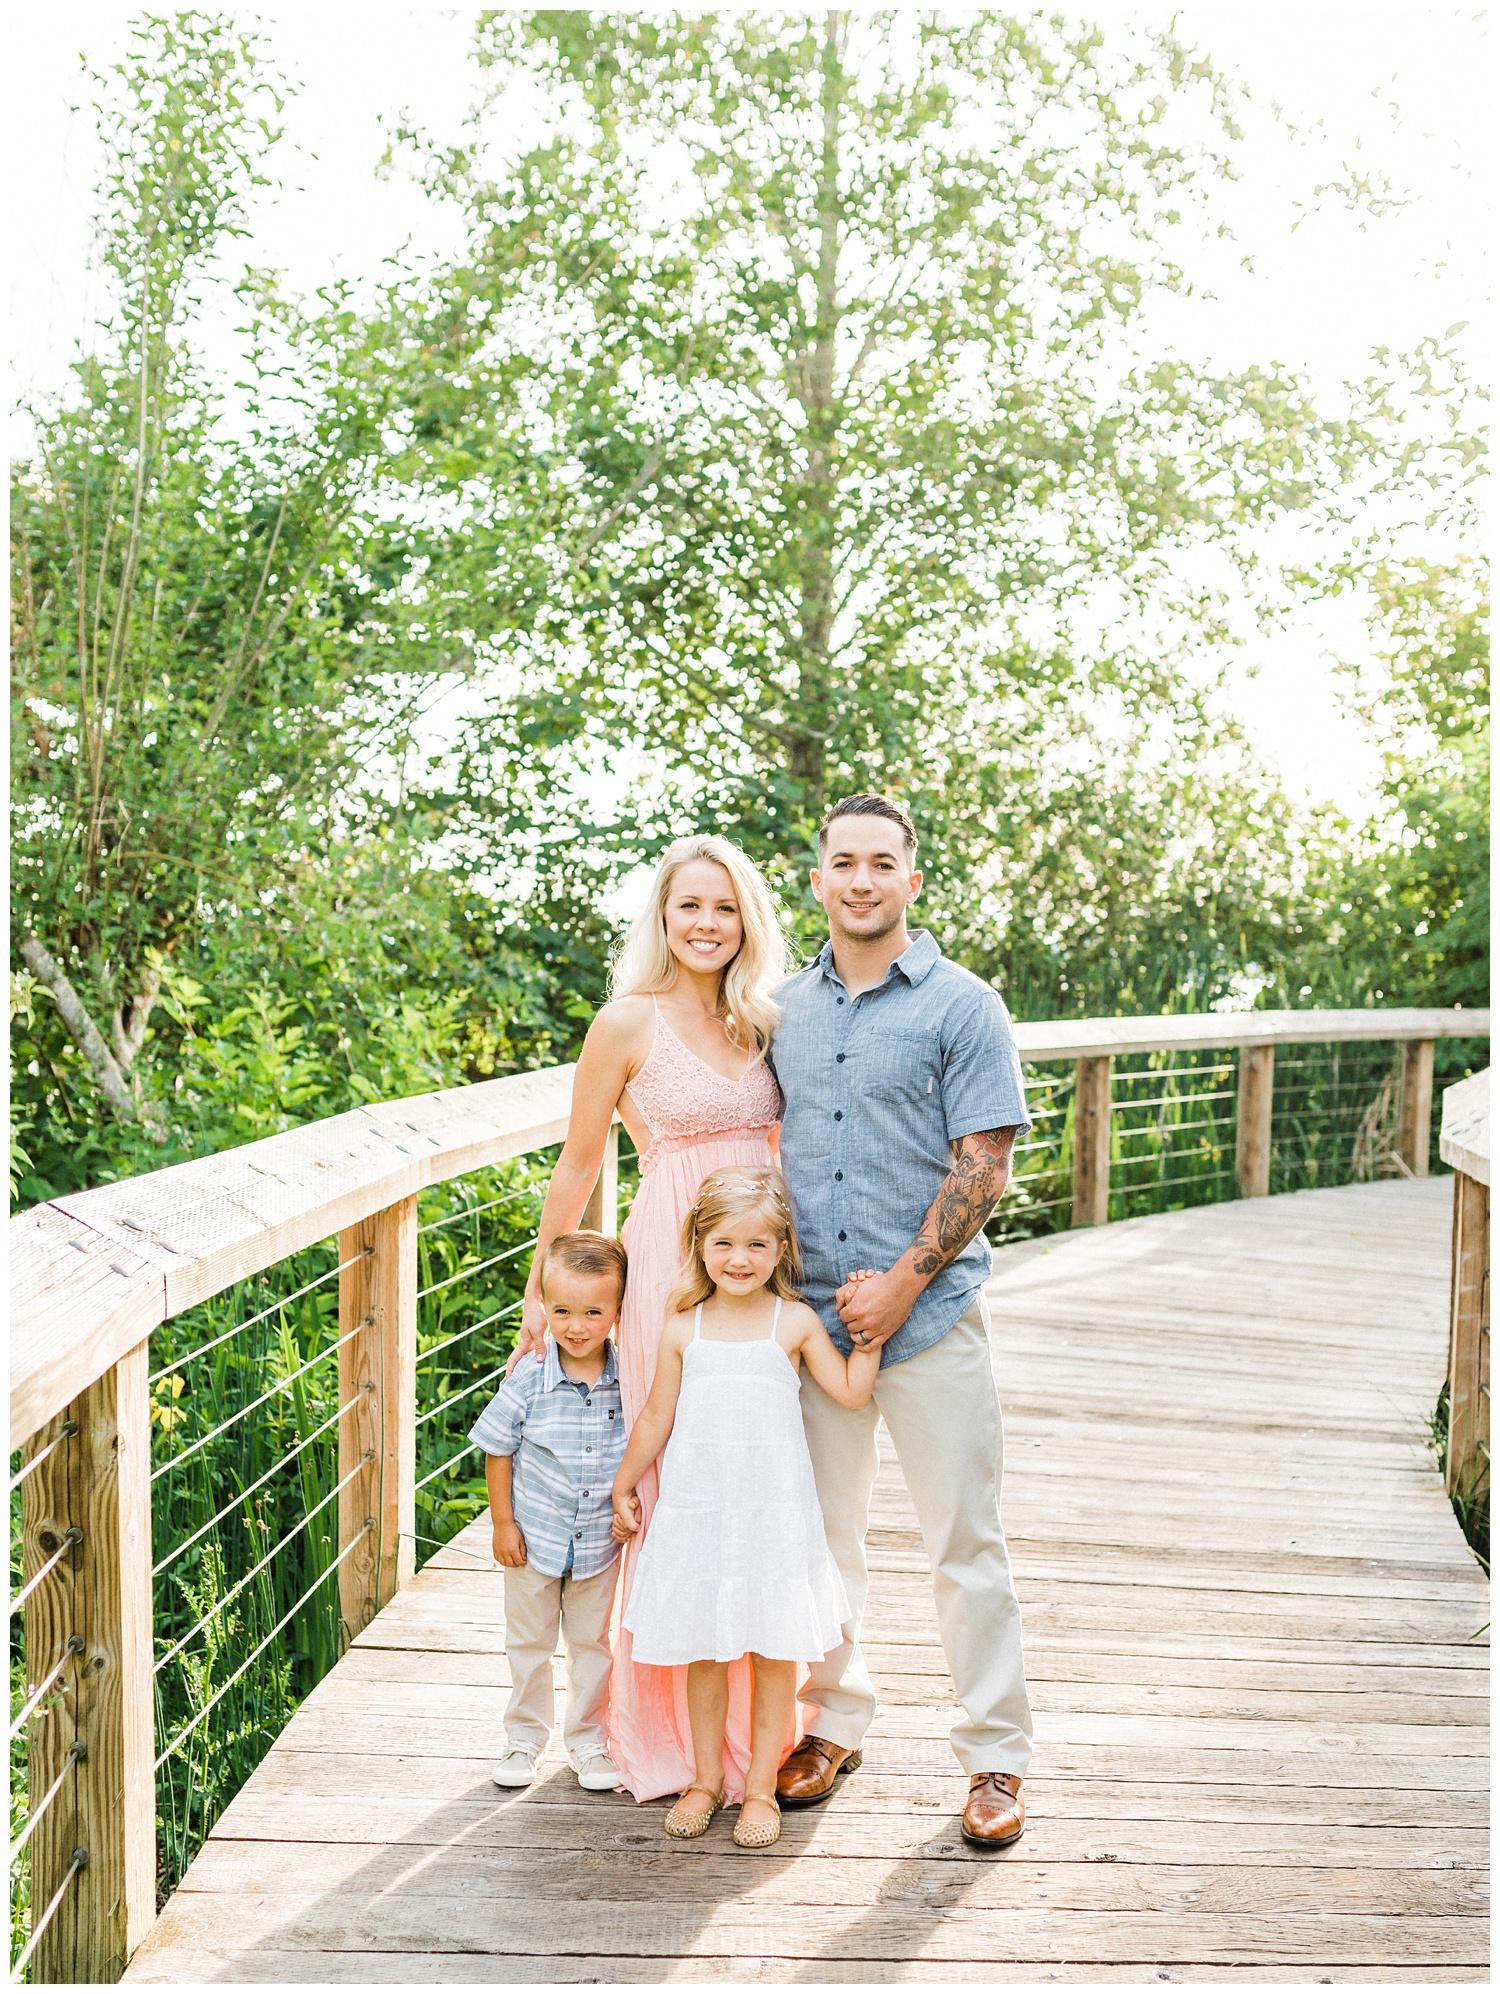 washginton-family-photographer_001.jpg